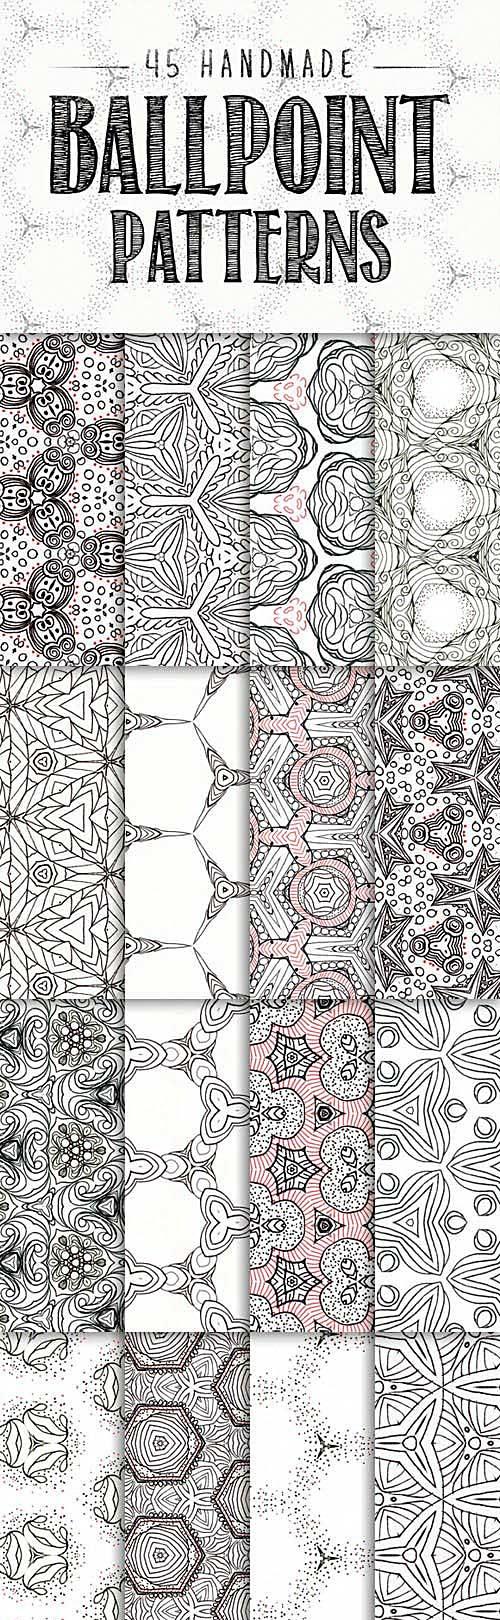 دانلود رایگان تکسچرمتریال کاغذ دیواری تری دی مکس ویری 3ds max Ballpoint Patterns